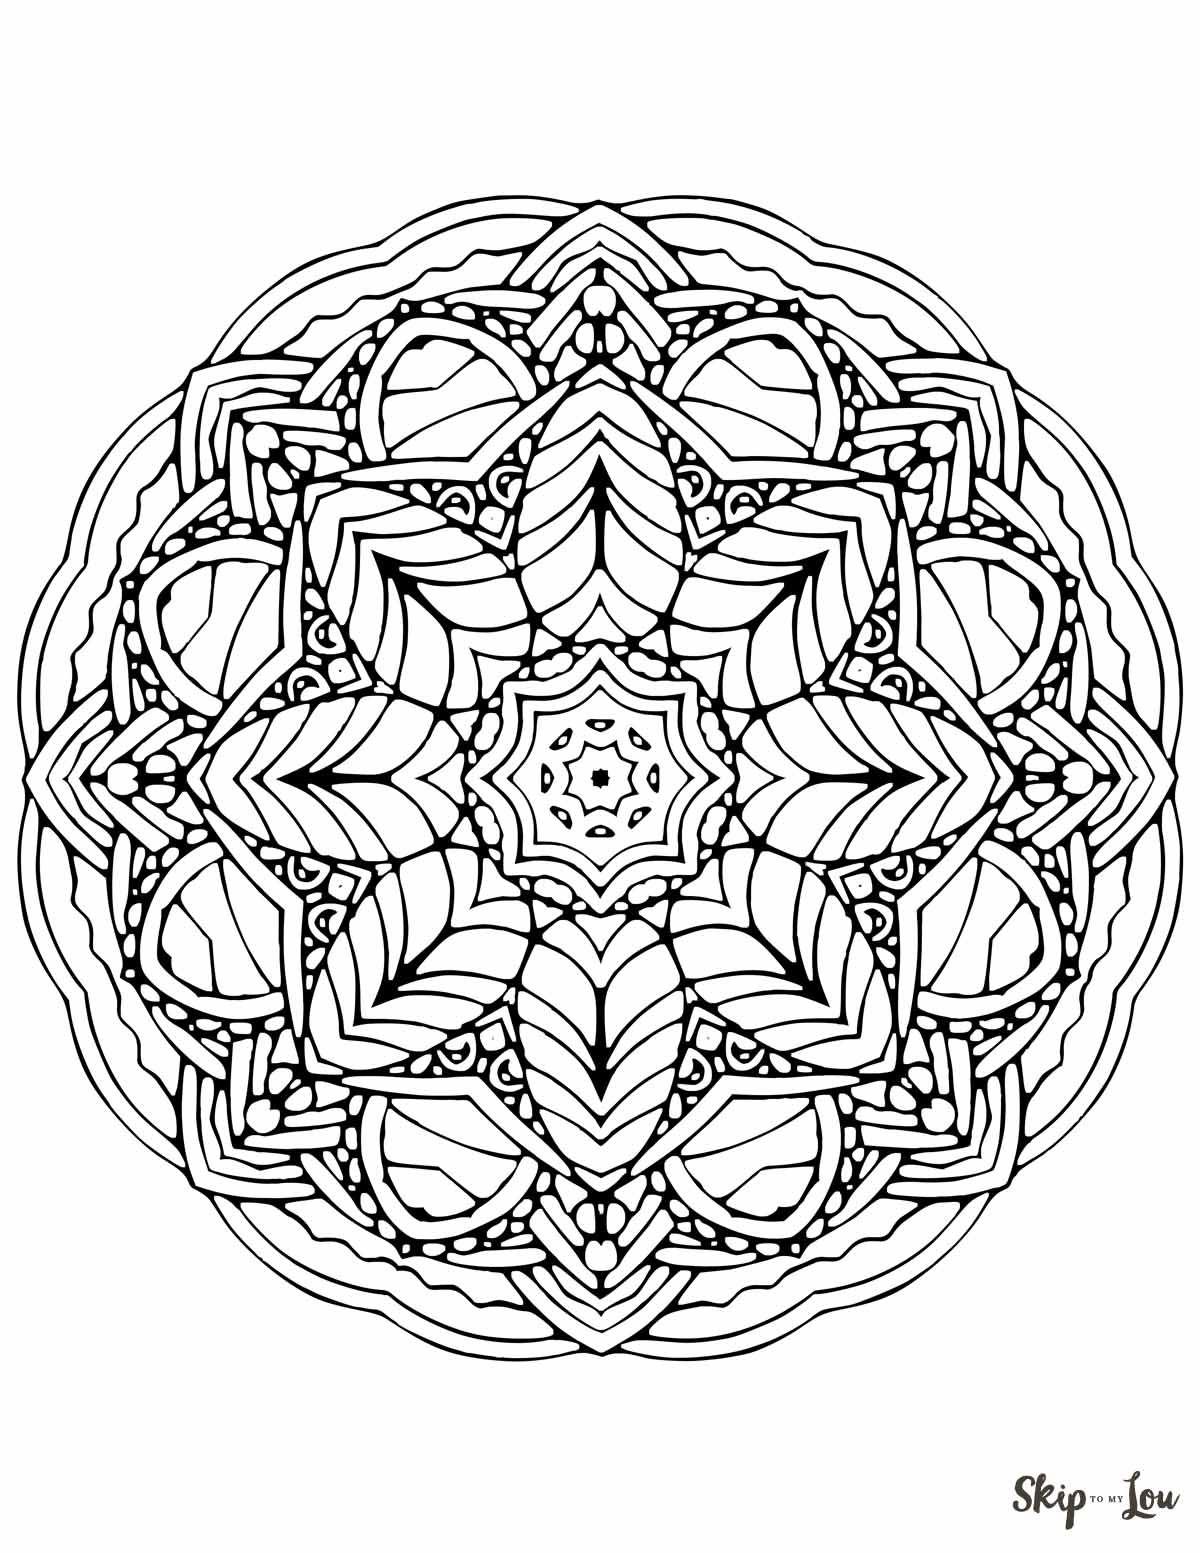 Beautiful Free Mandala Coloring Pages Mandala Coloring Pages Love Coloring Pages Mandala Coloring Books